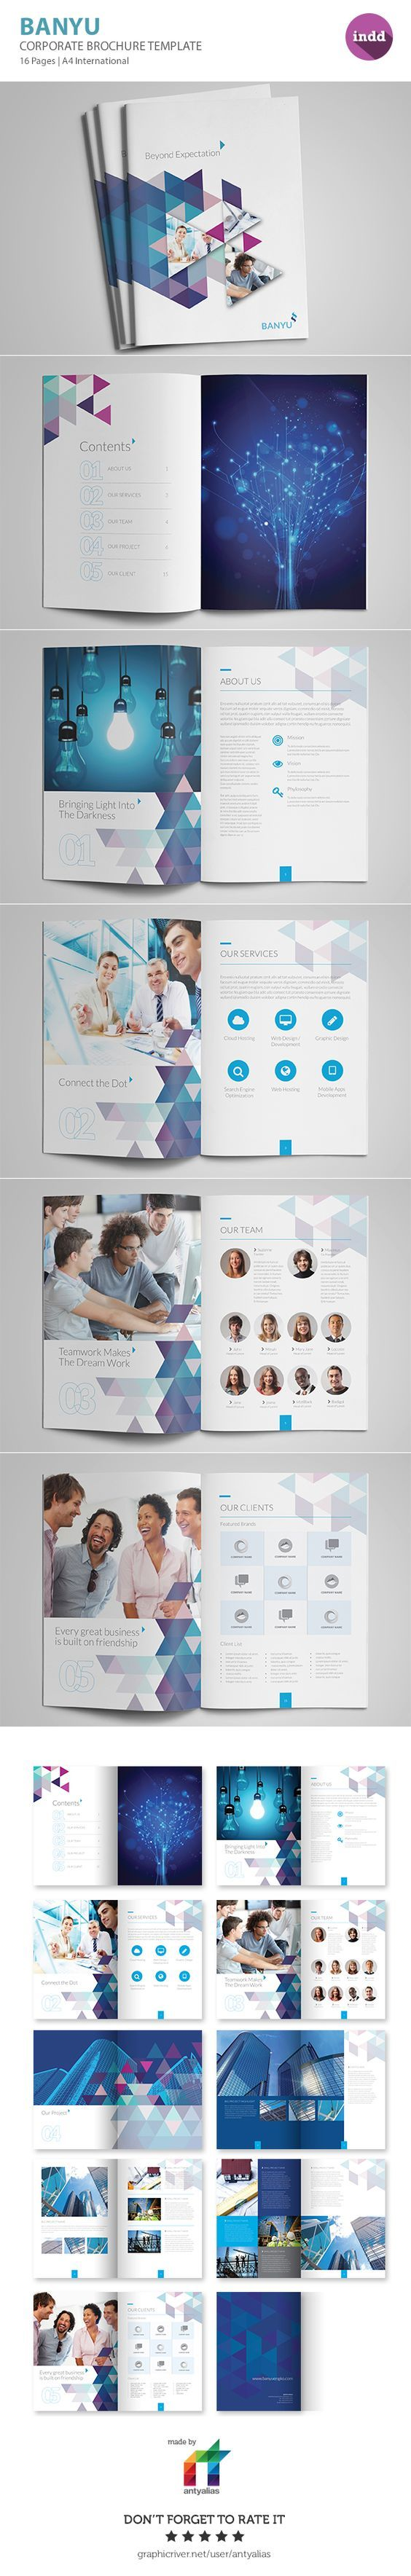 BANYU - Professional Corporate Brochure Templates by Alias Hamdi, via Behance: